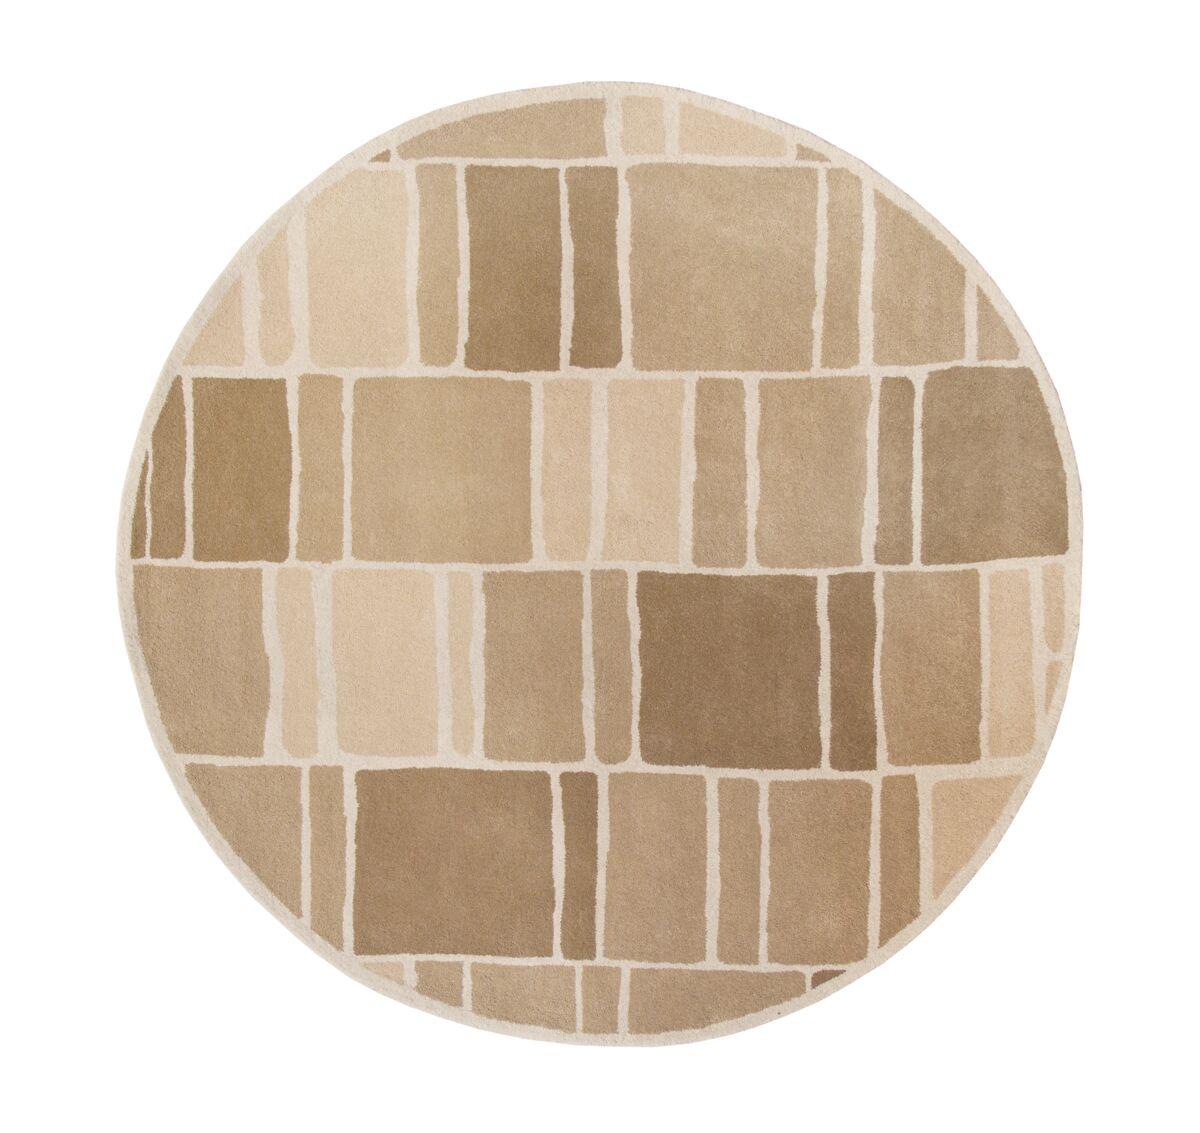 Blocks Hand-Loomed Camel / Ivory Area Rug Rug Size: Round 8' x 8'